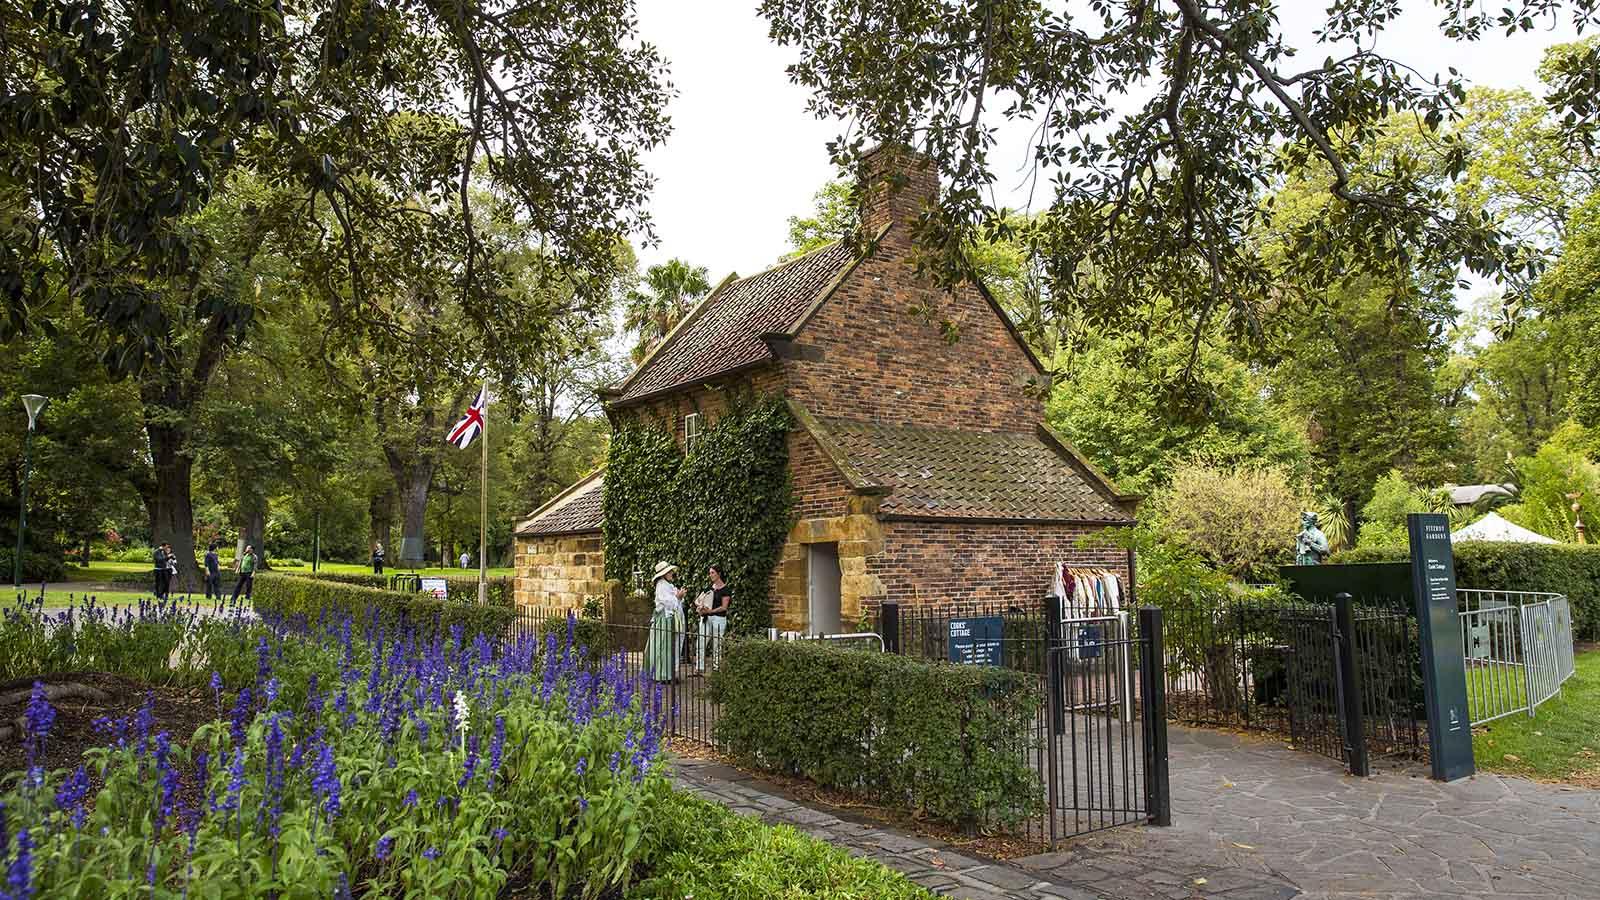 Cooks Cottage at Fitzroy Gardens, Melbourne, Victoria, Australia